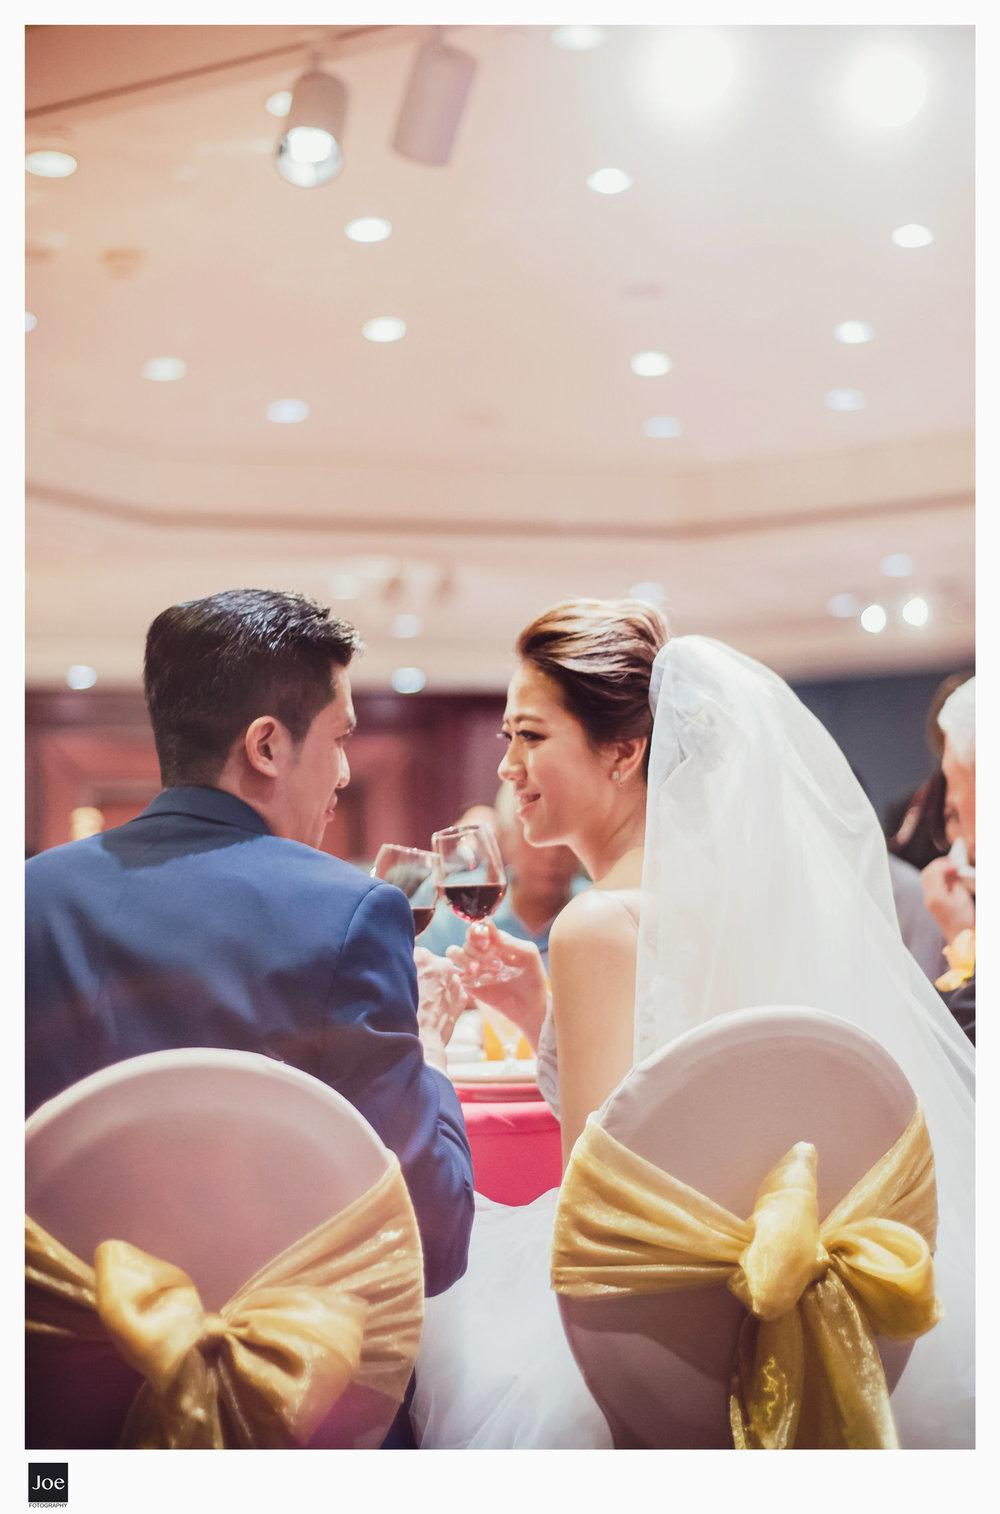 wedding-photography-shangri-la-far-eastern-plaza-hotel-ariel-sam-joe-fotography-154.jpg